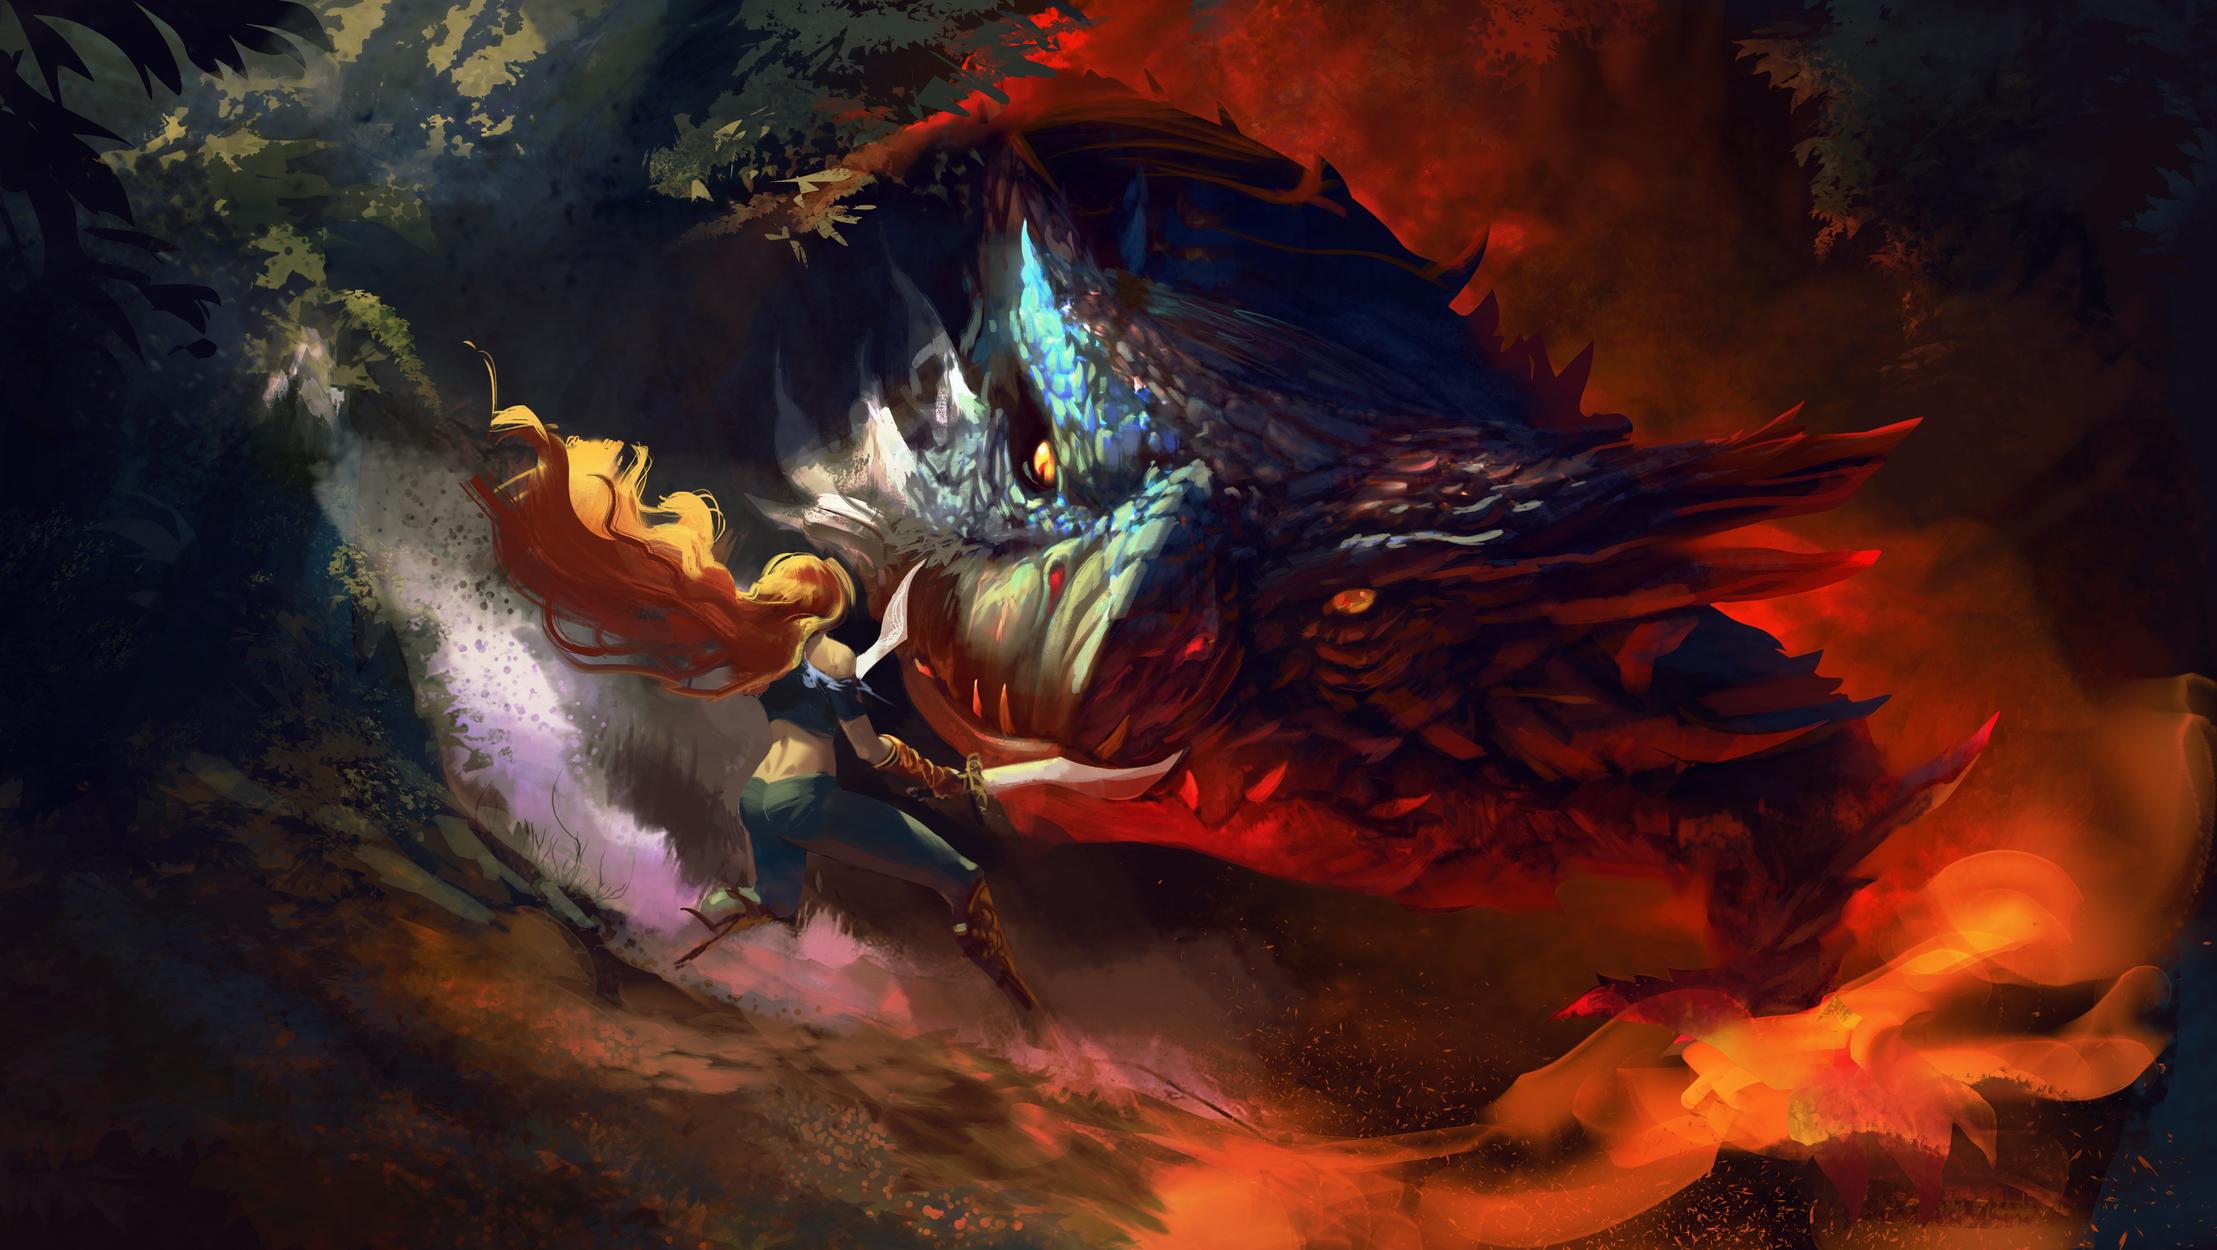 Face the Dragon Artwork by Dalton Muniz